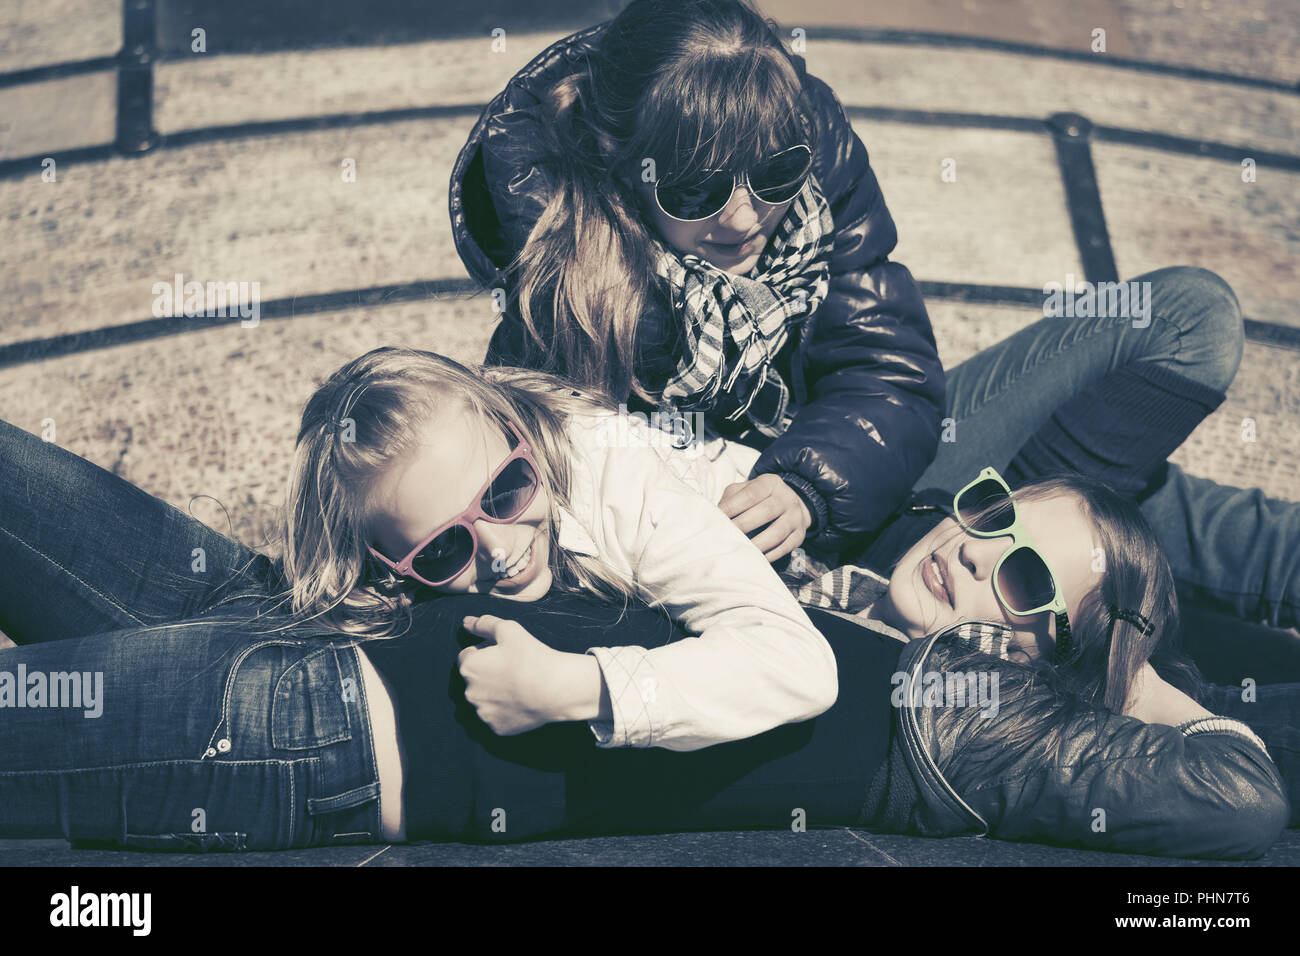 Gruppo di felice teen ragazze in una strada di città Immagini Stock